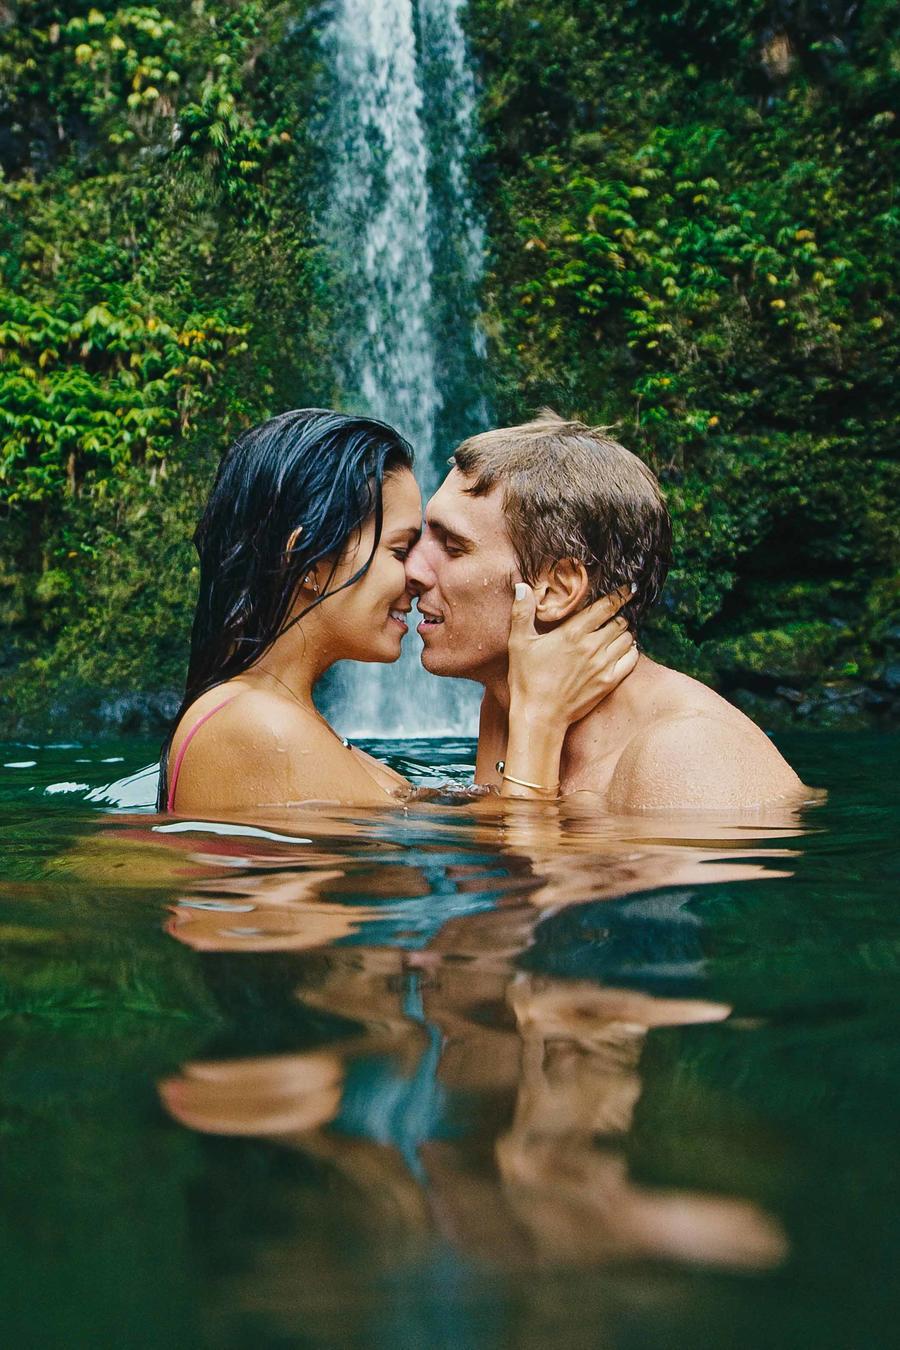 Pareja besándose en un lago